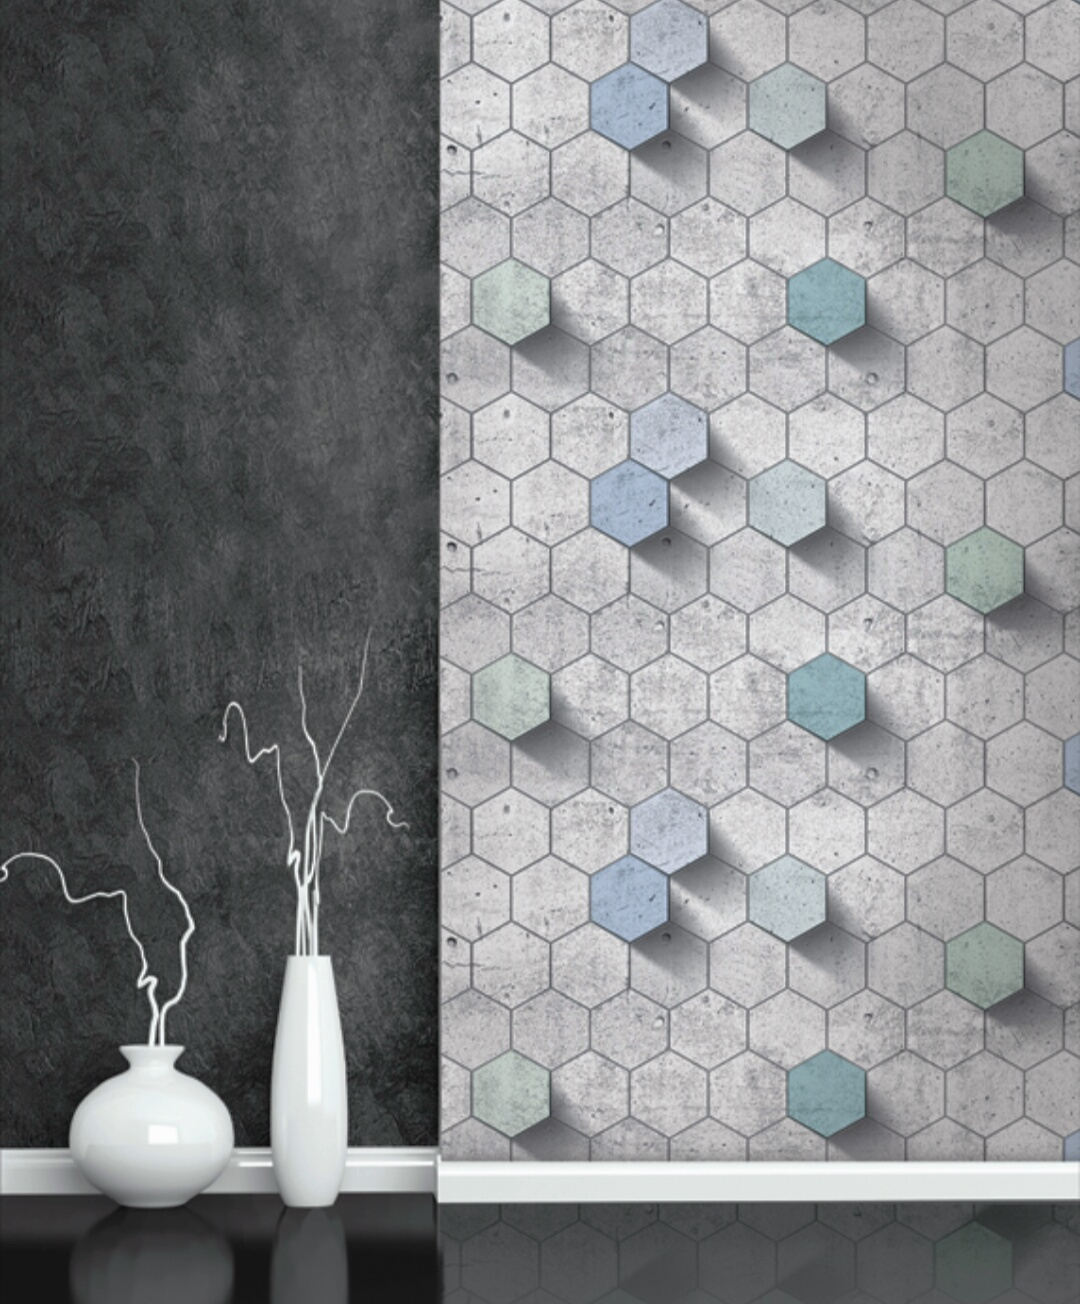 کاغذ دیواری سه بعدی | طراحی سه بعدی کاغذ دیواری,کاغذ دیواری متنوع,انواع کاغذ دیواری 3بعدی